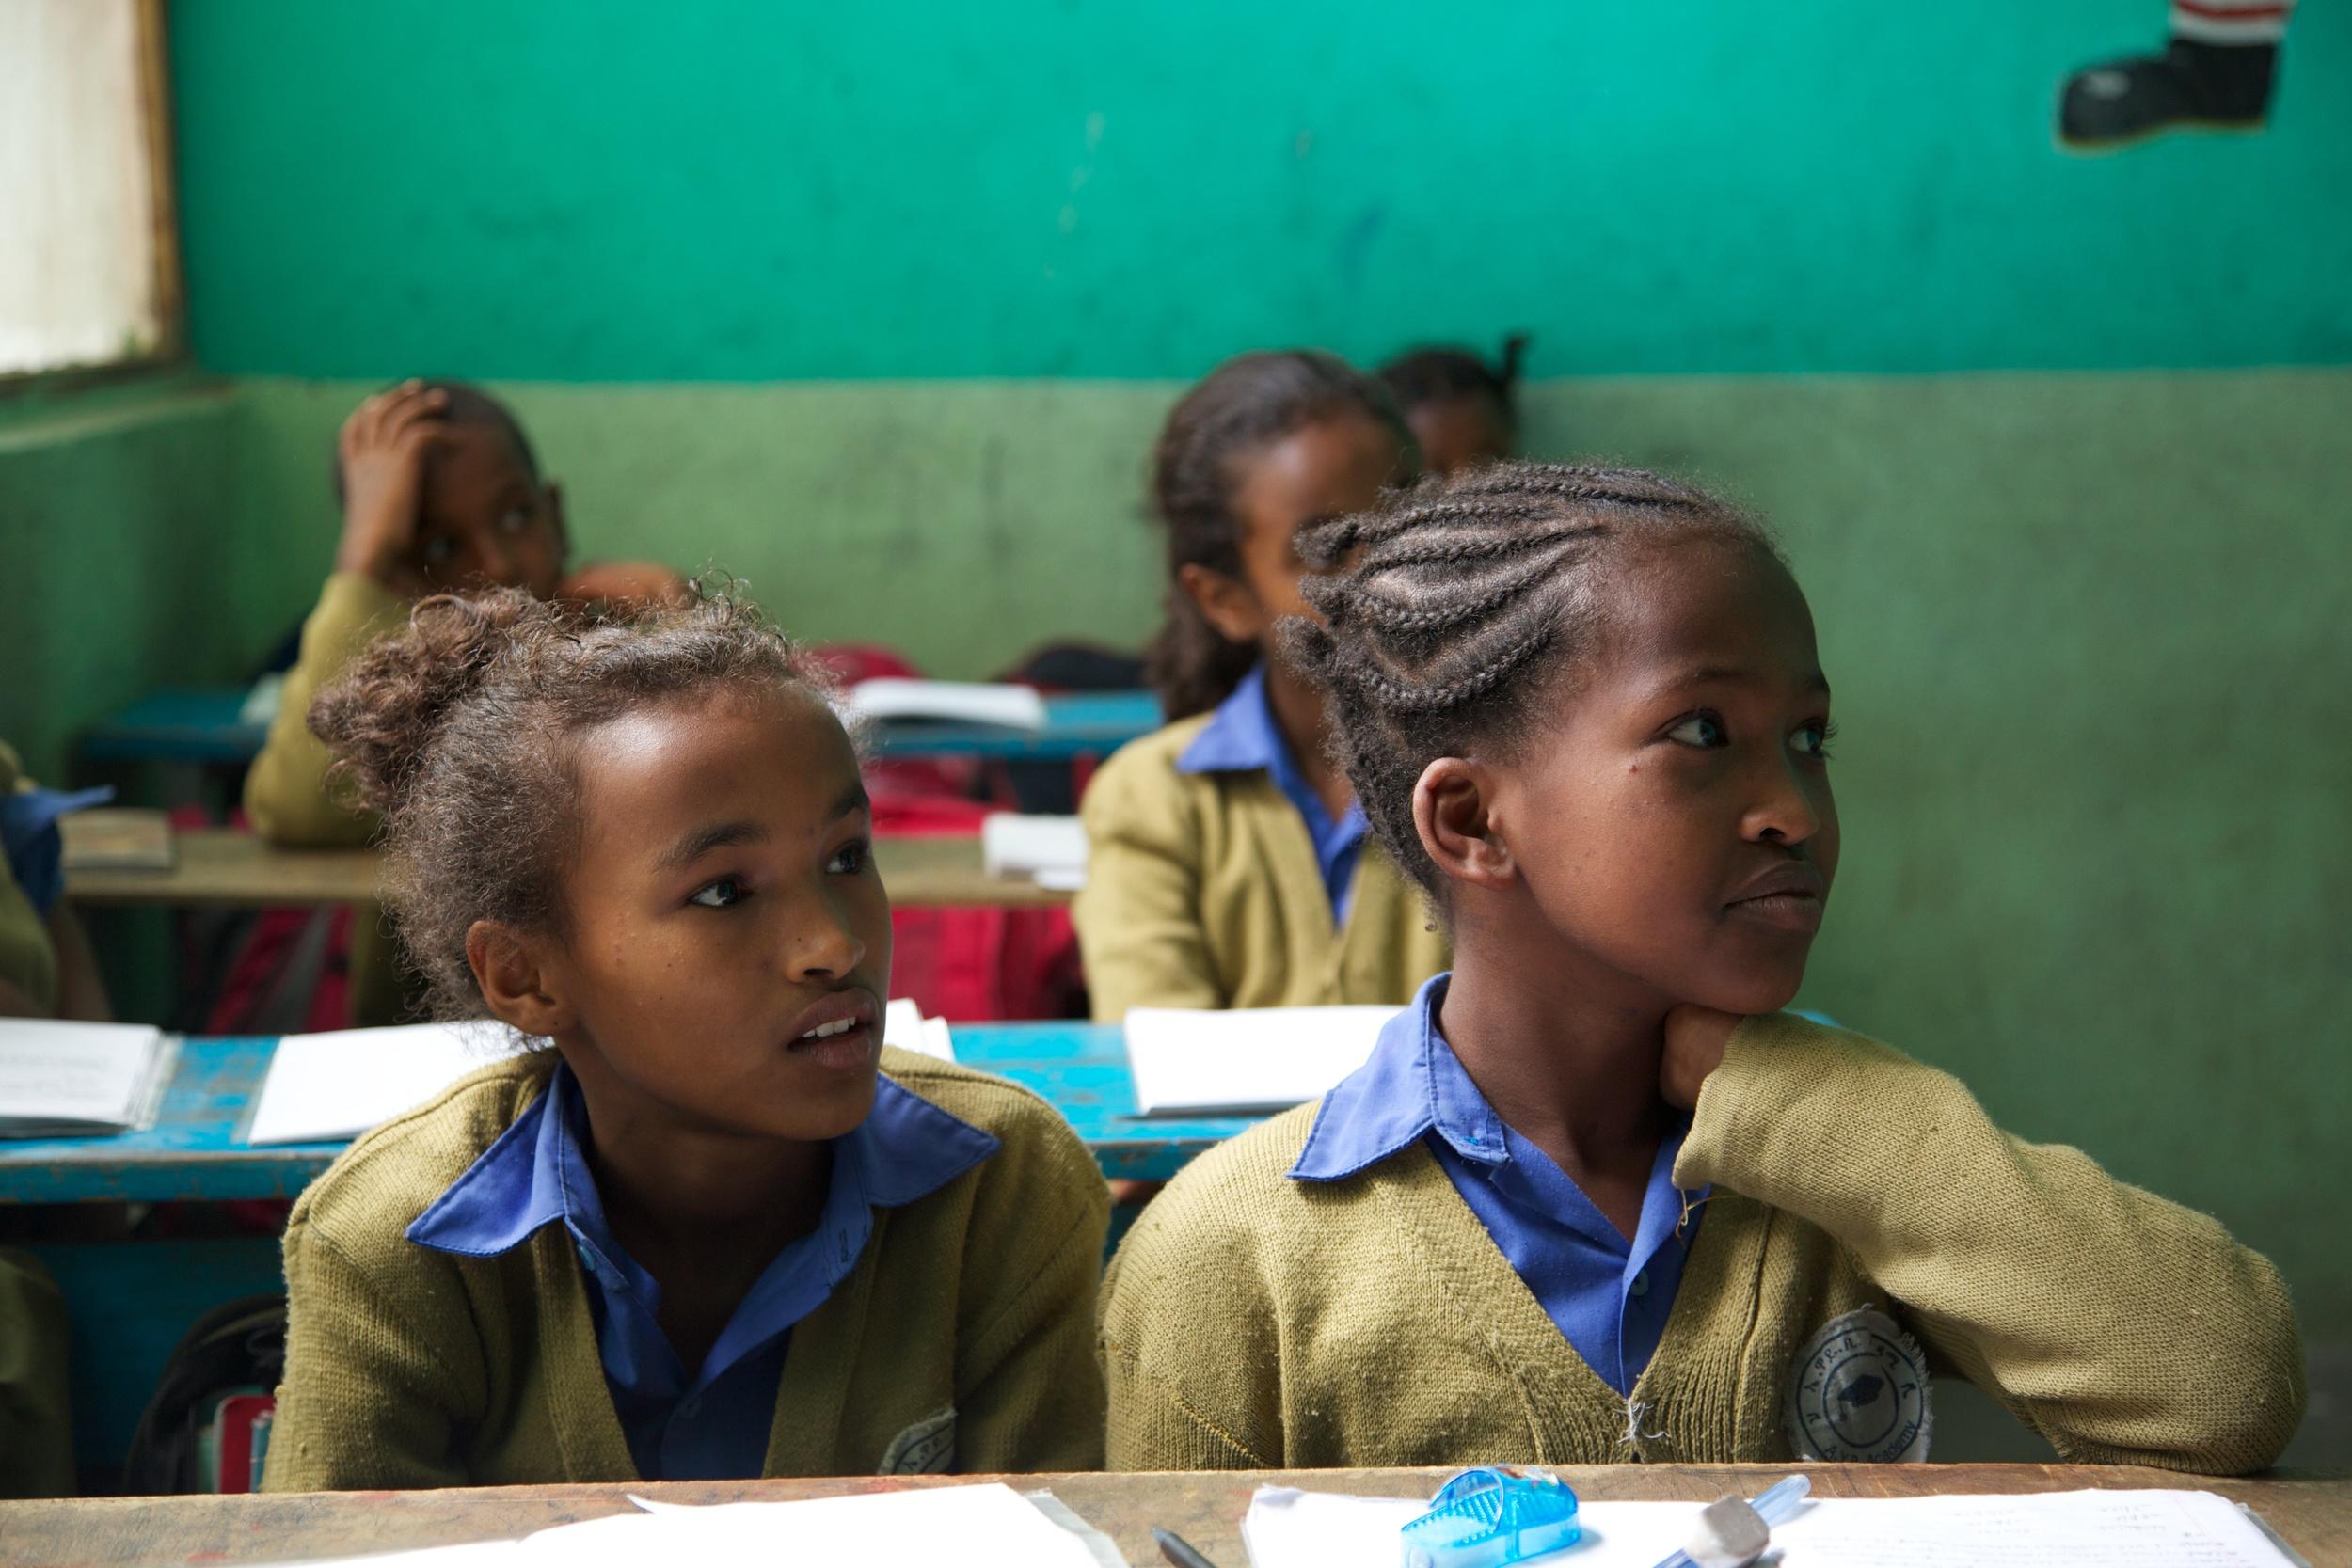 Ethiopia_website 29.jpg